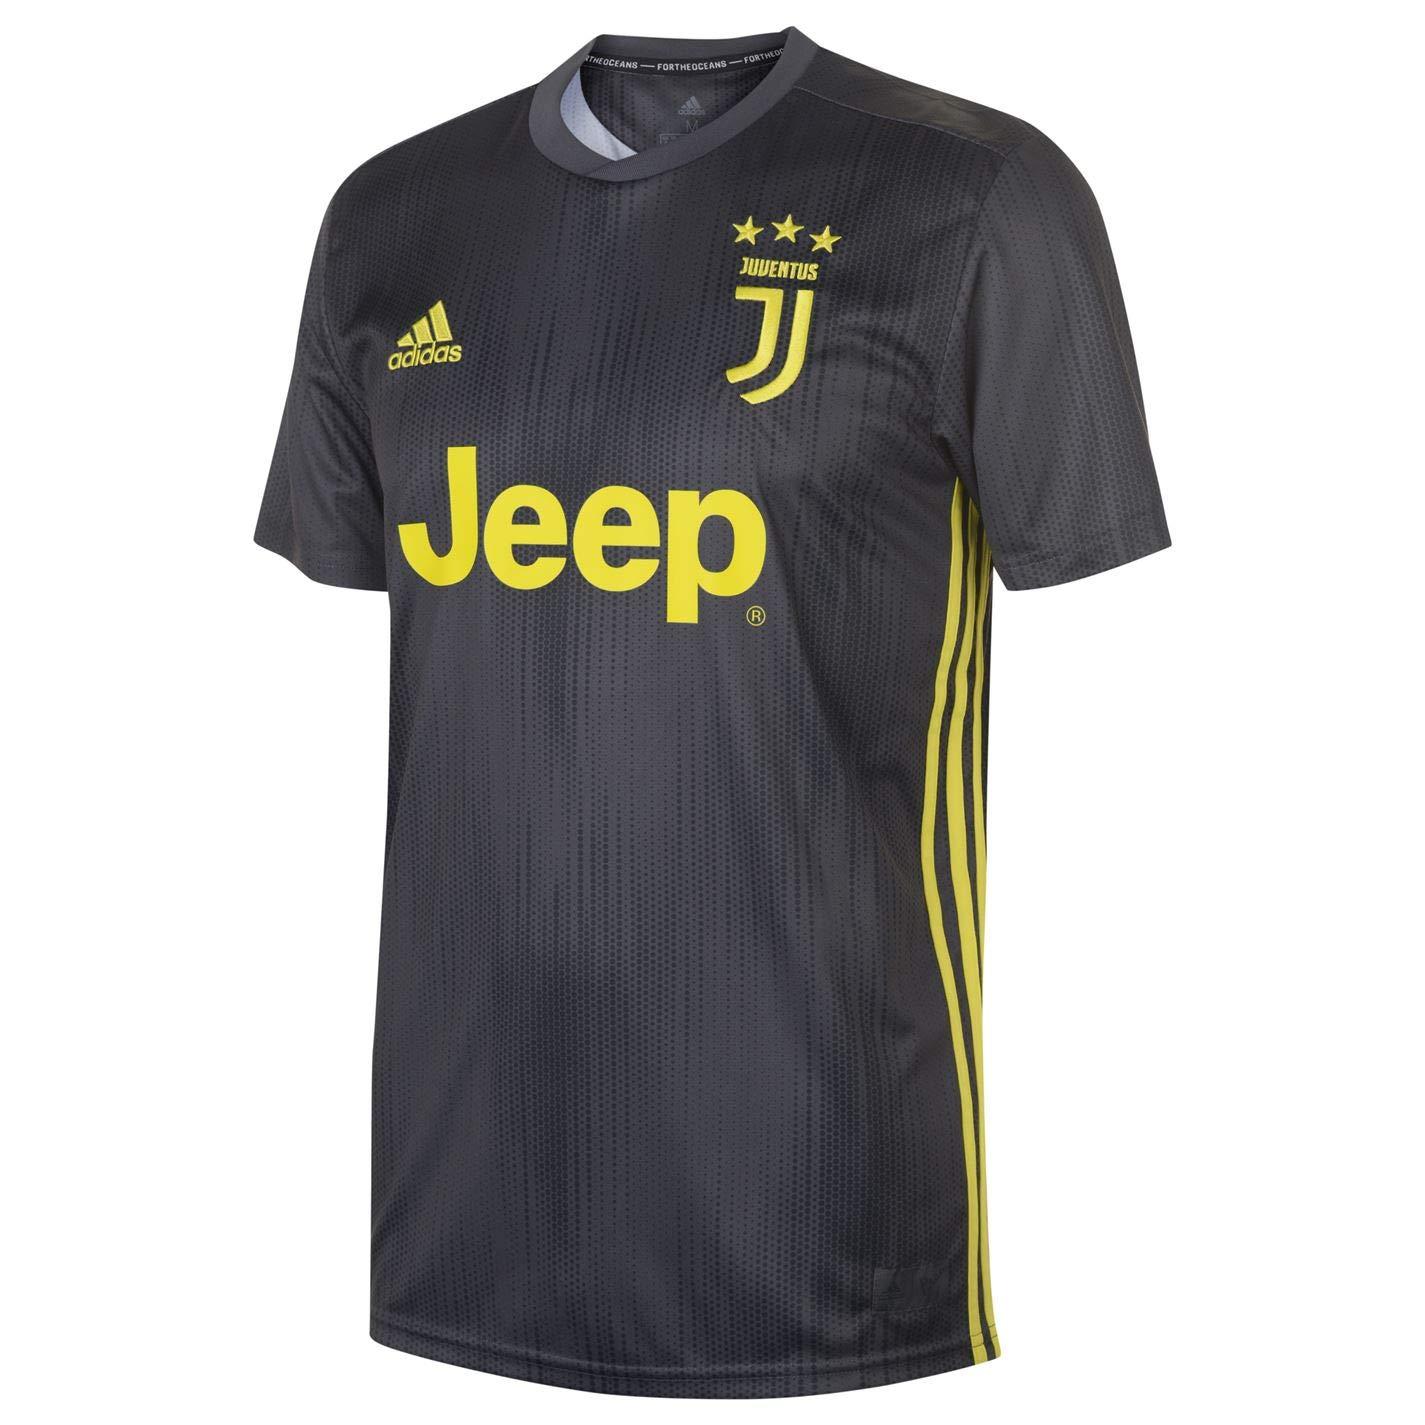 finest selection 6292e 38c18 adidas Men's Juventus Turin Ausweichtrikot Replica Shirt